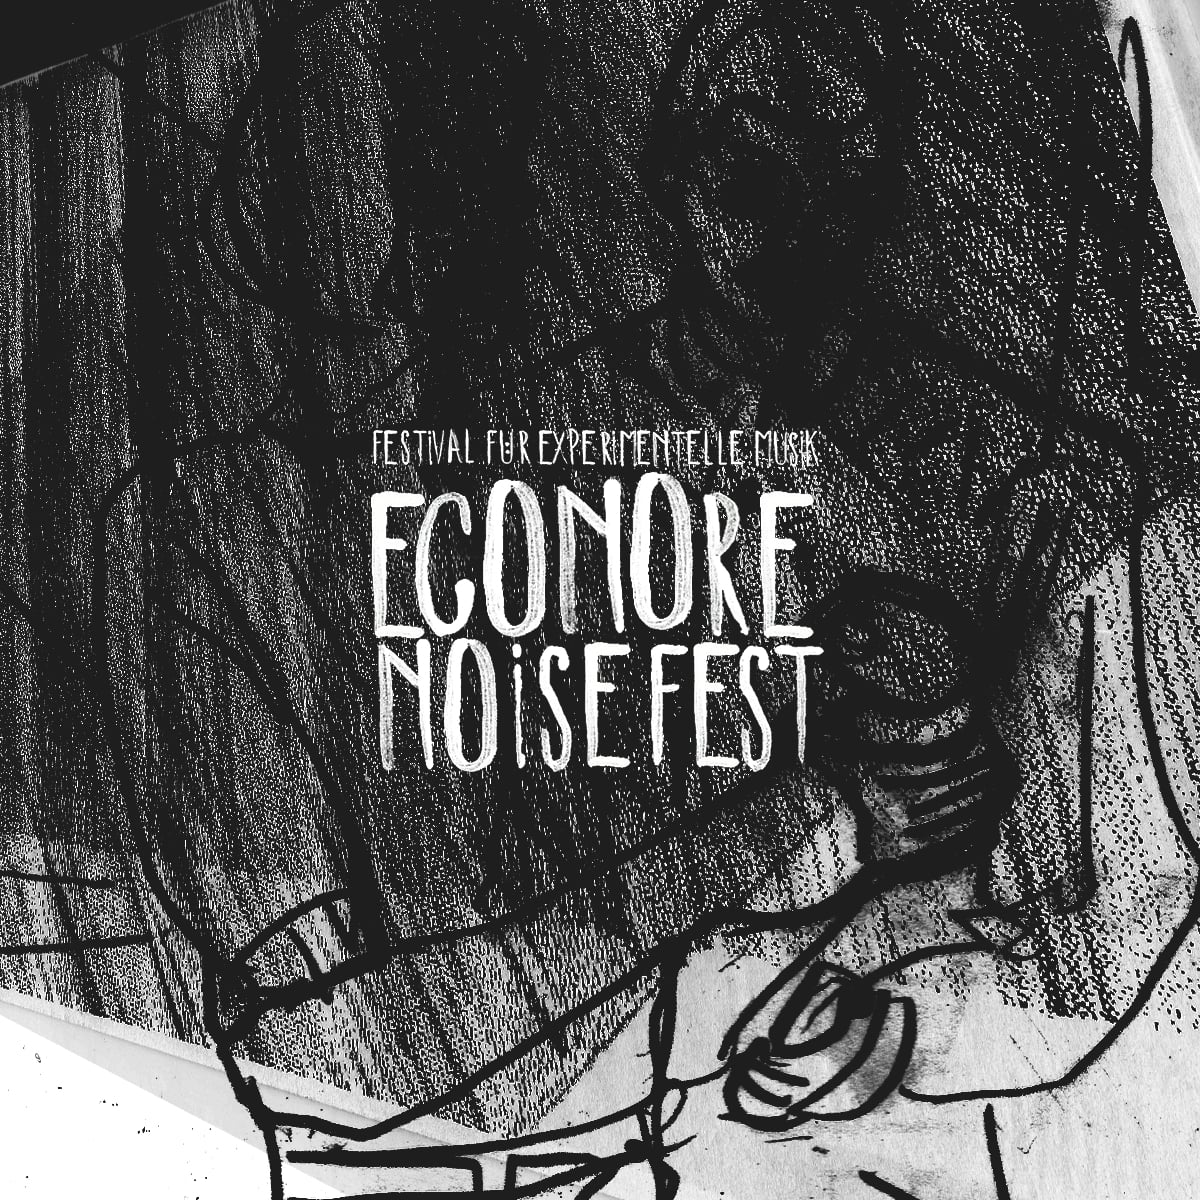 Econore Noise Fest 2018 – Festival für experimentelle Musik in Mönchengladbach